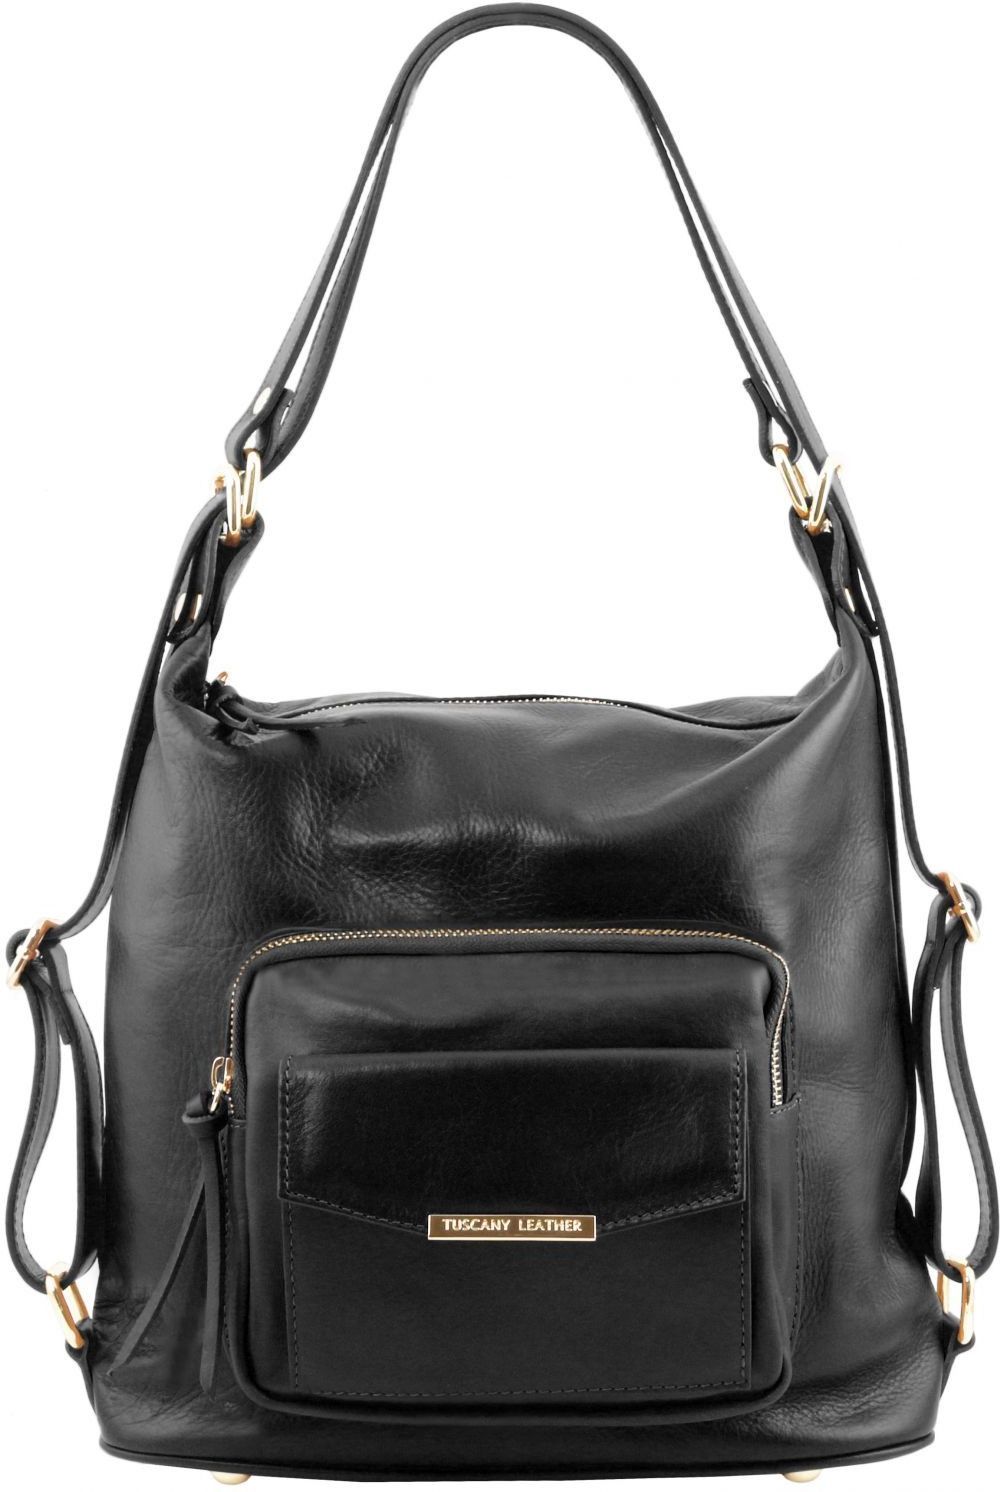 d59b51818a Γυναικεία Τσάντα Δερμάτινη Ώμου   Πλάτης TL141535 Μαύρο Tuscany Leather